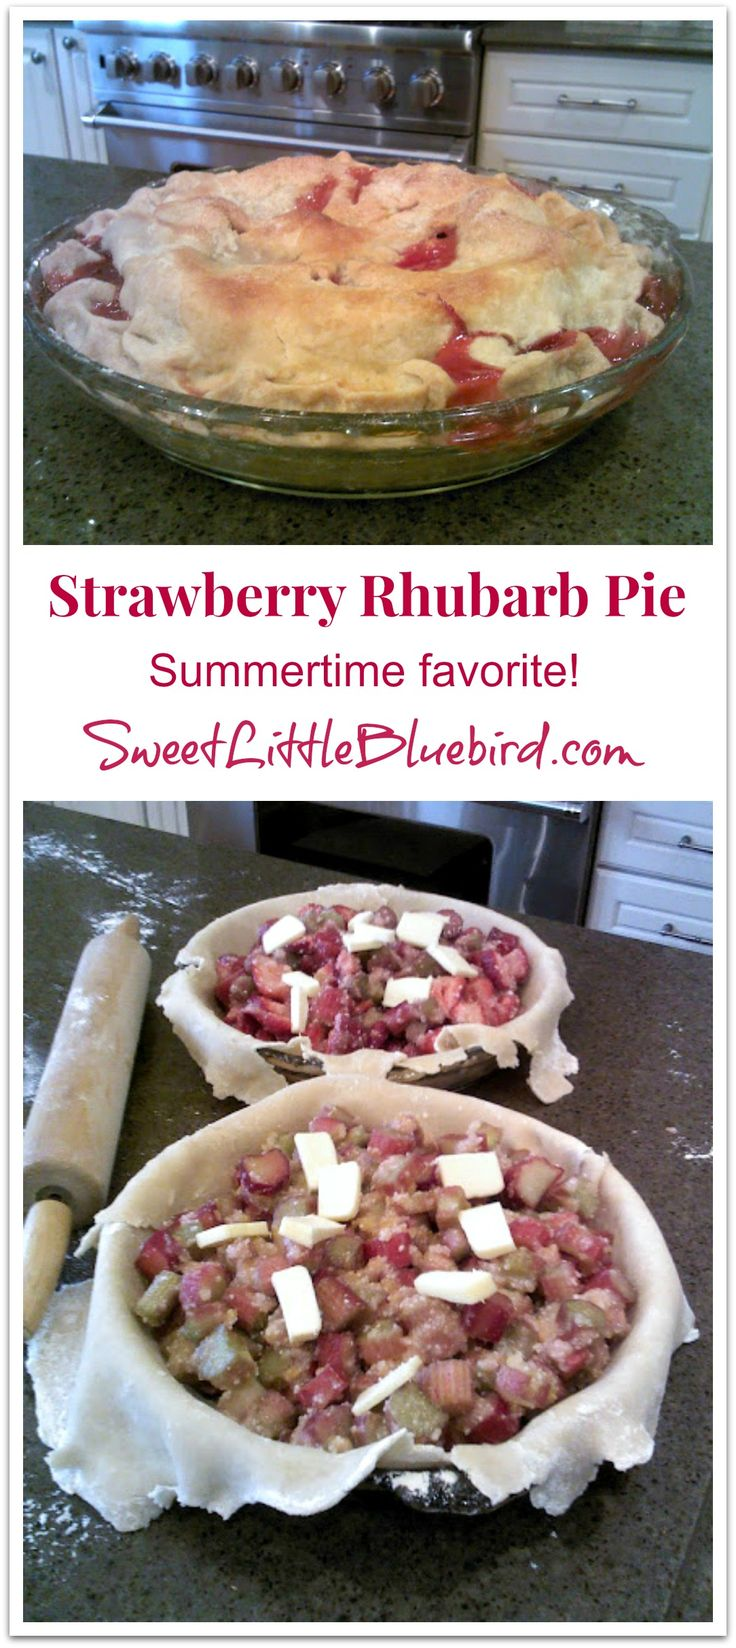 25+ best ideas about Crisco Pie Crust Recipe on Pinterest ...